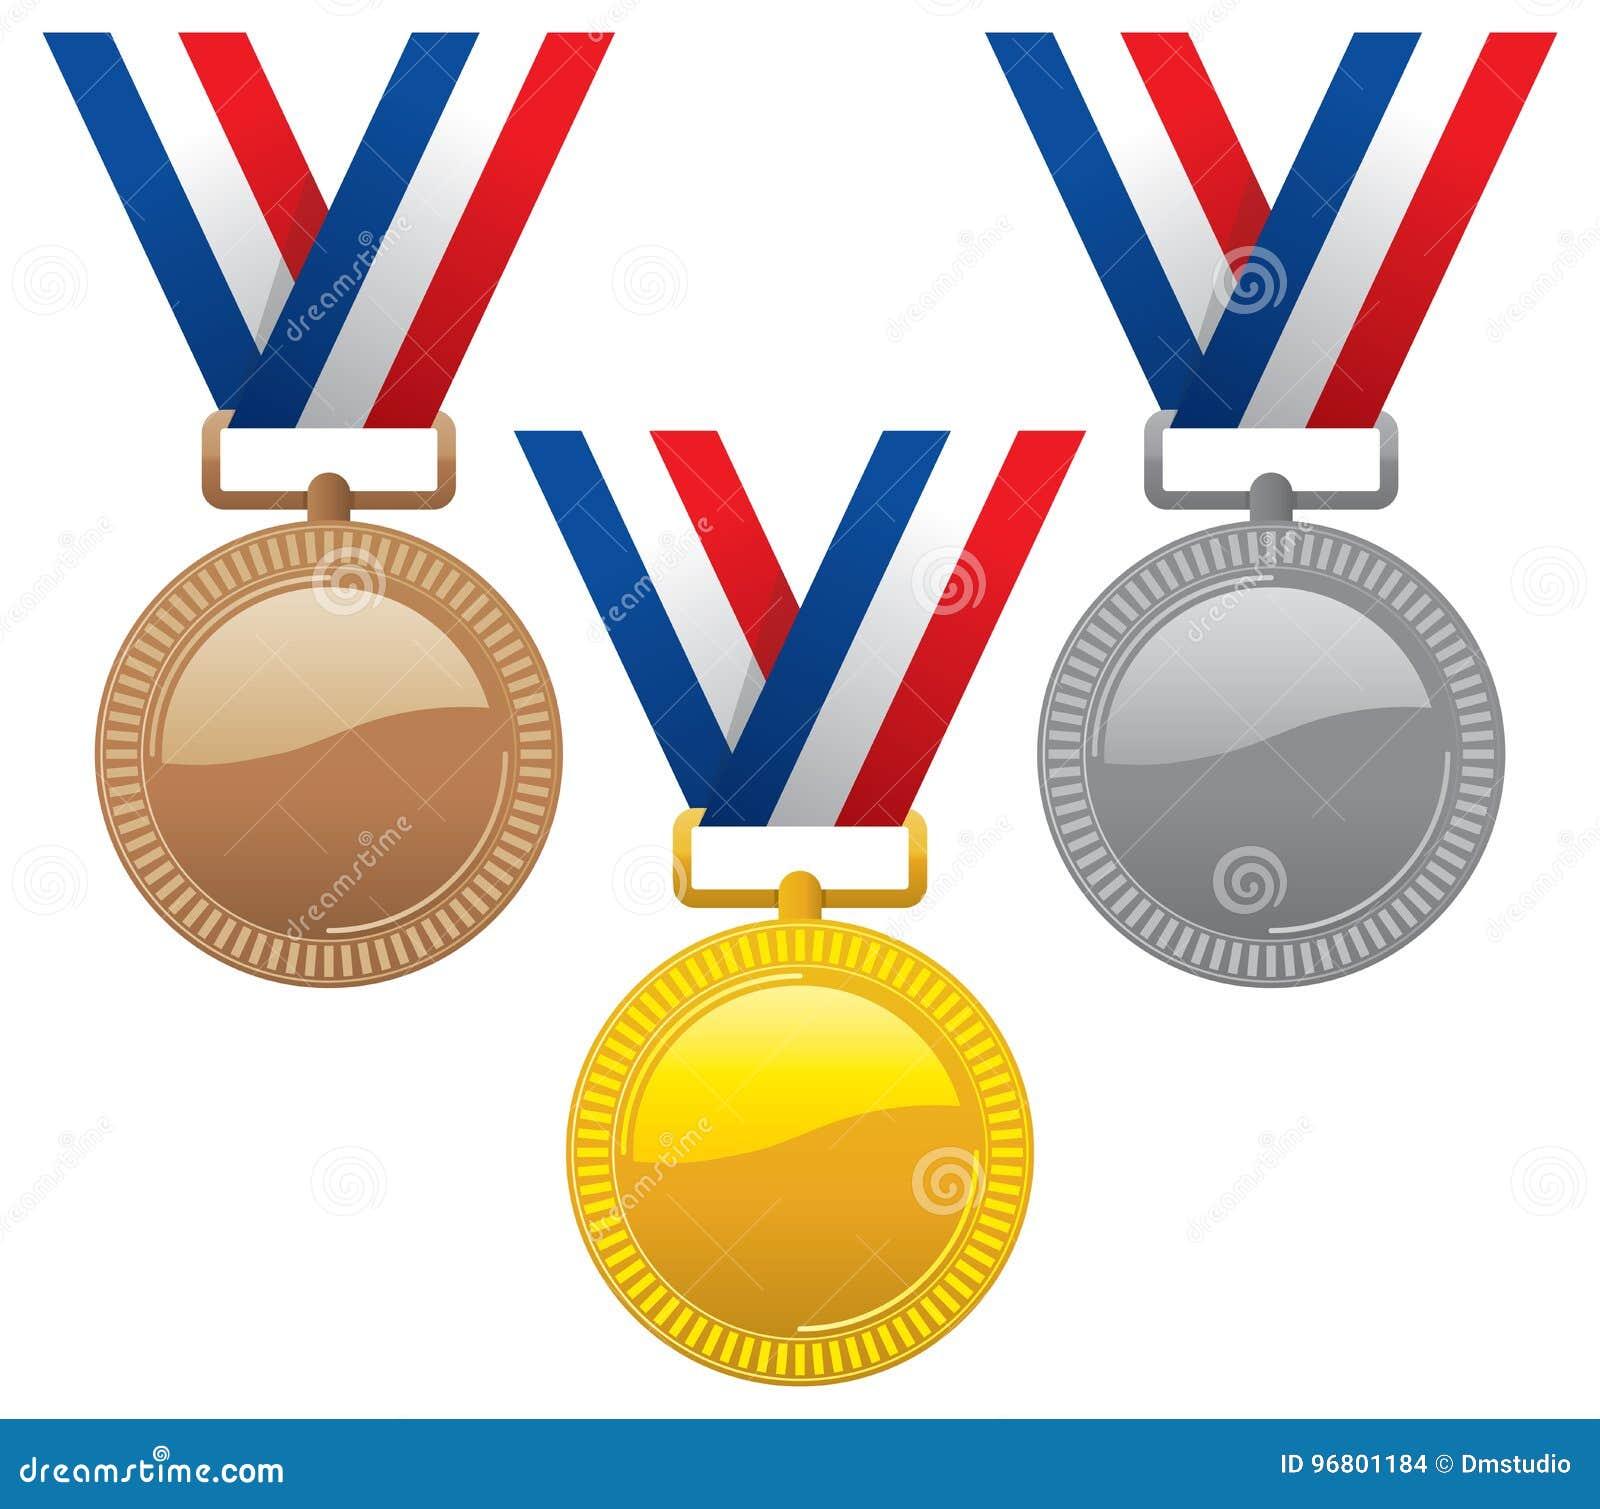 Bronze guldmedaljer inställd silver